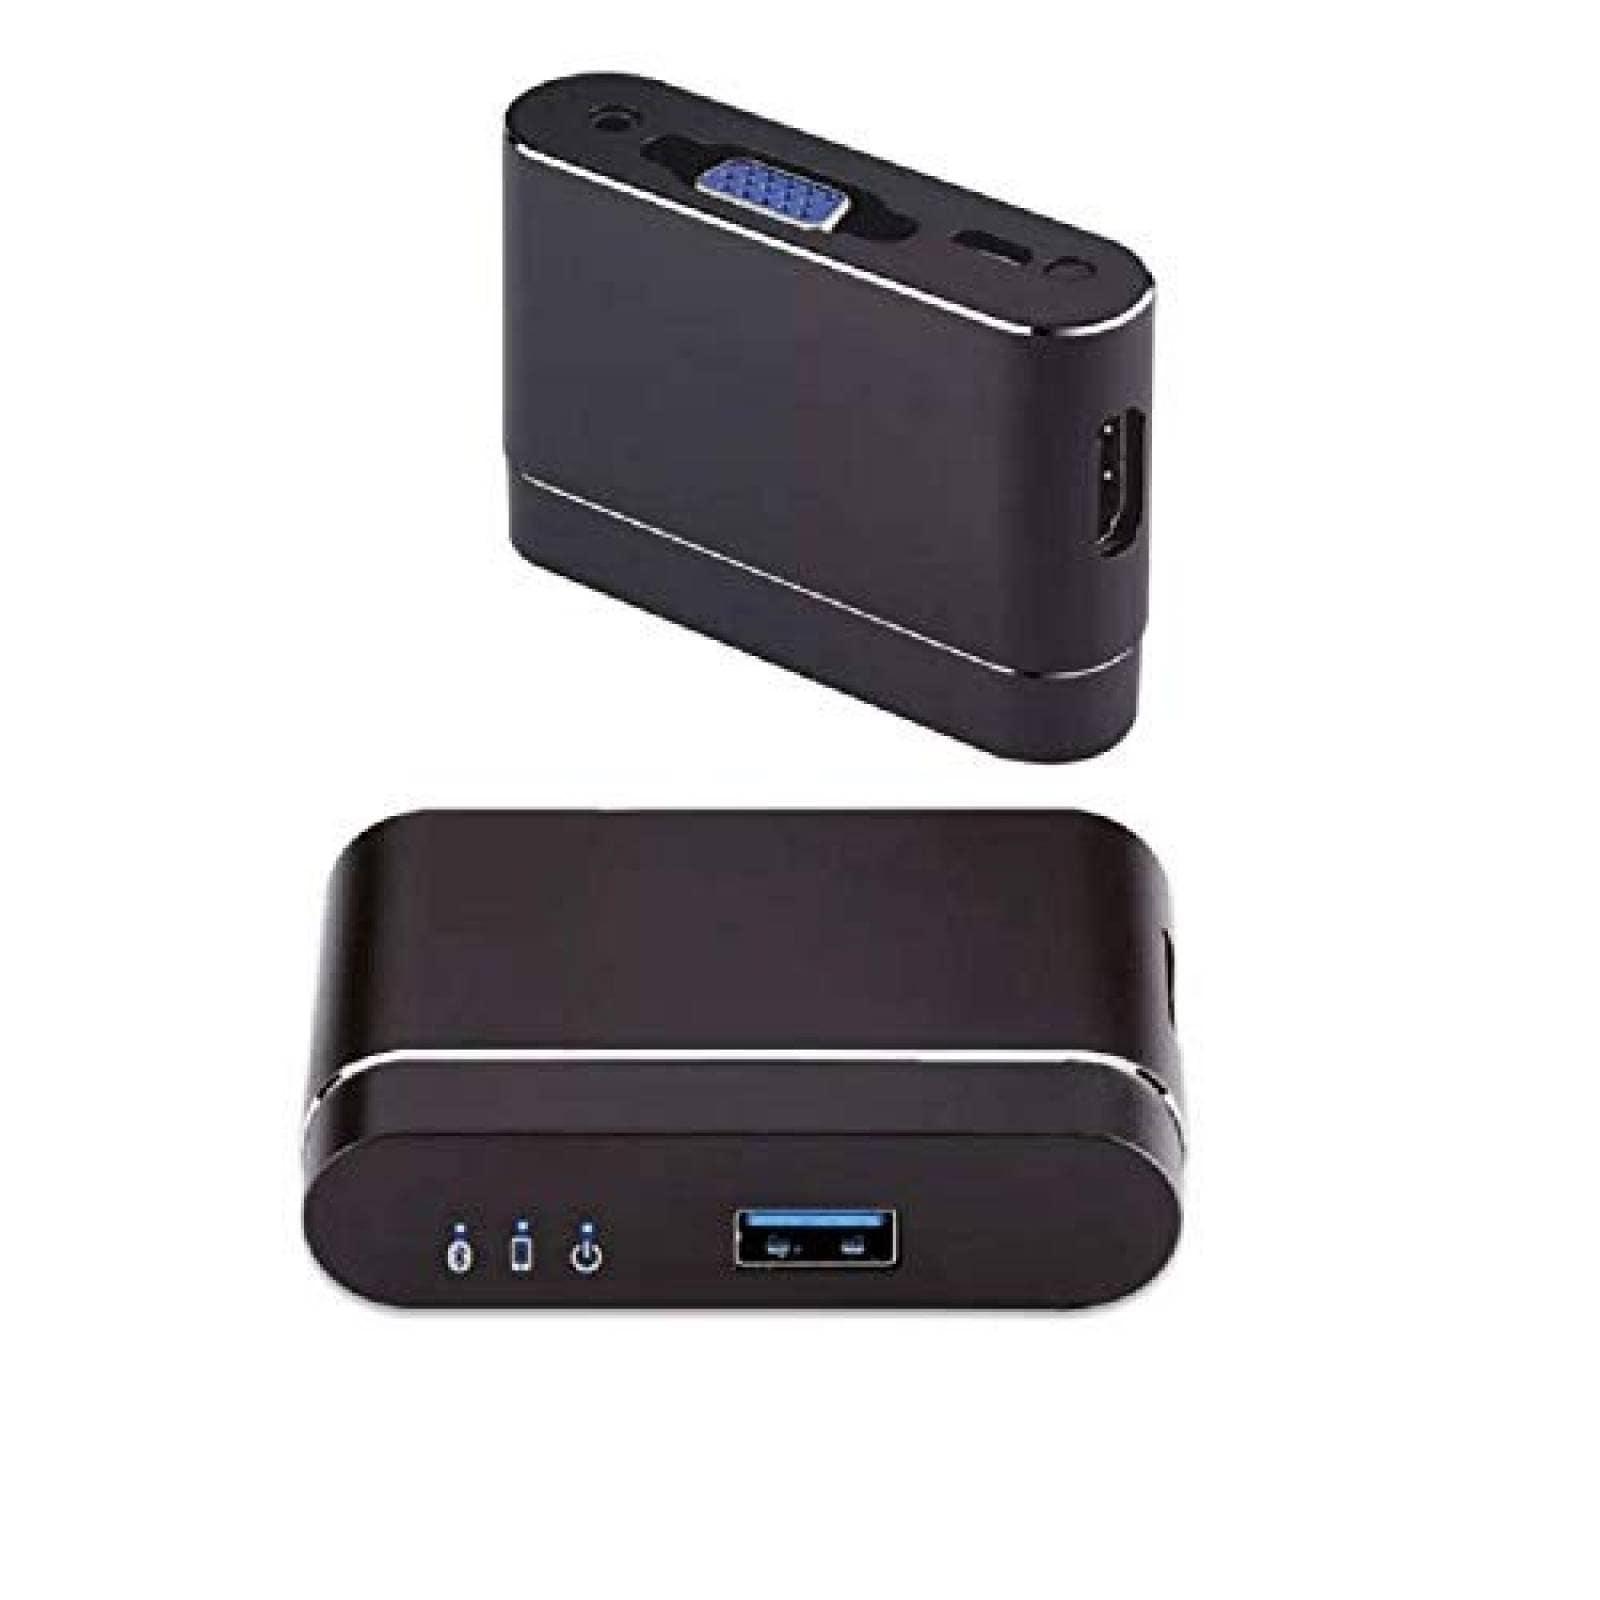 Adaptador USB AooYu a VGA y HDMI TV proyector iOS Android